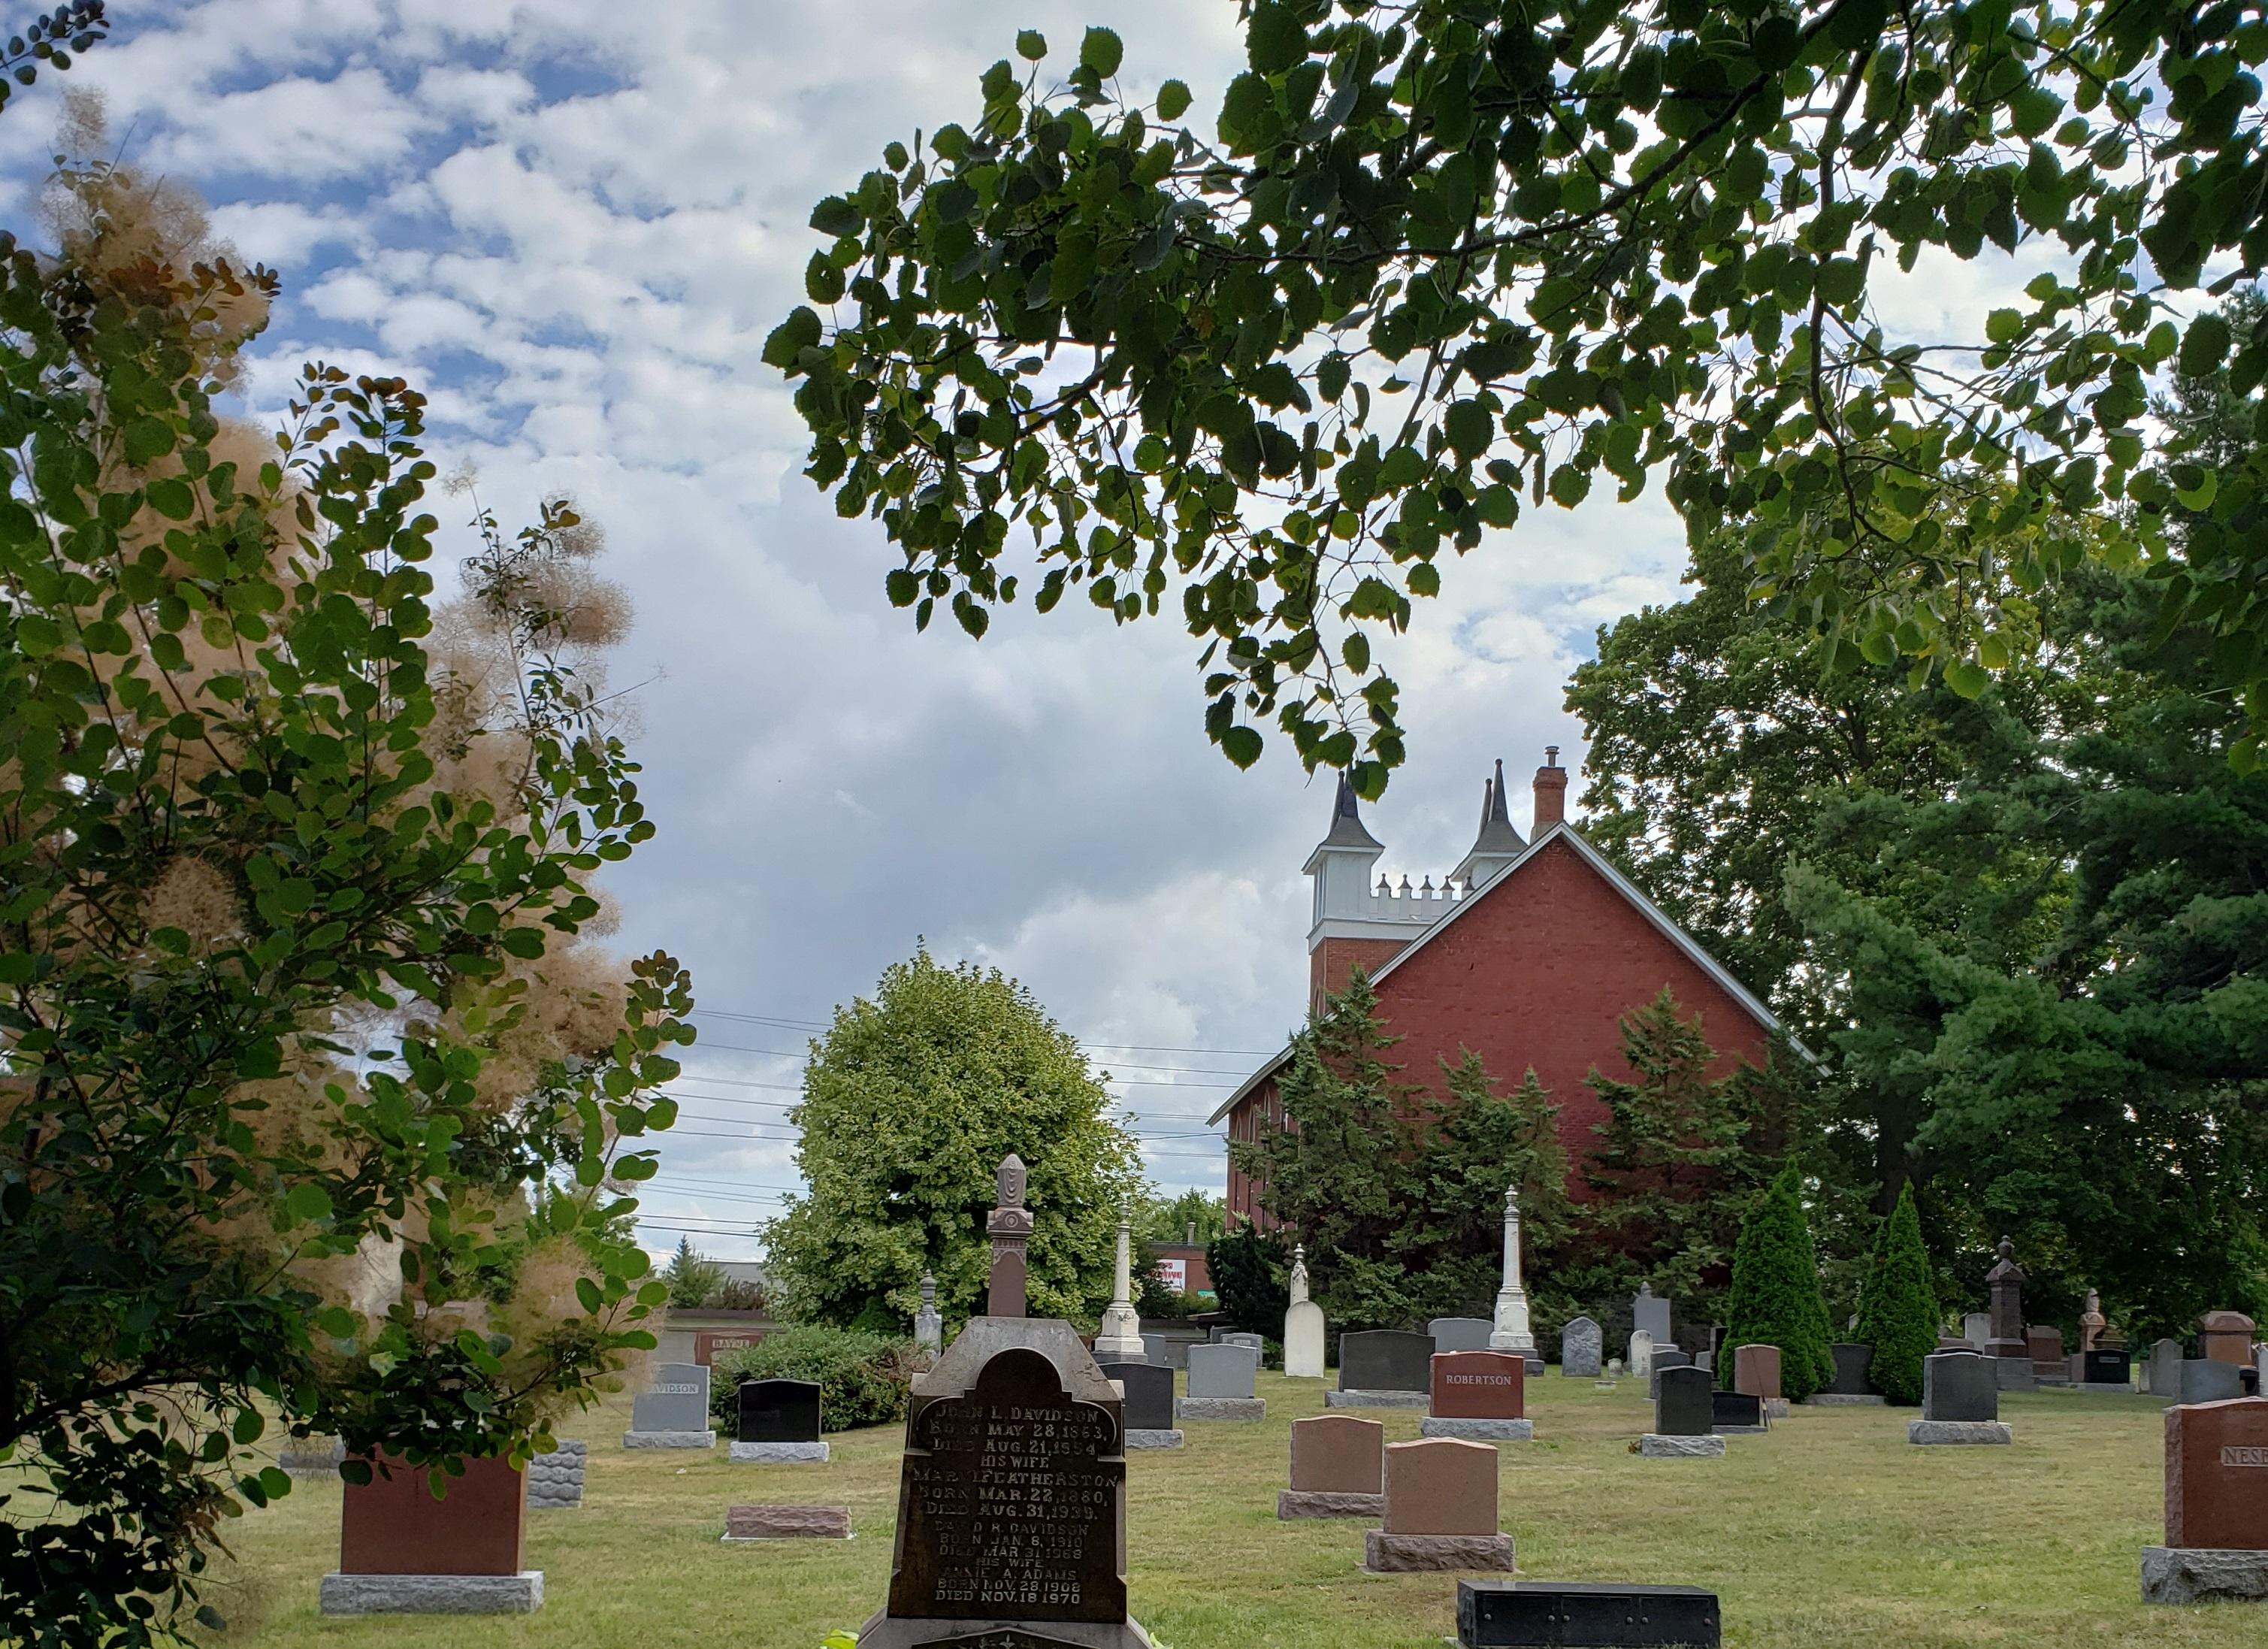 Quiet garden and cemetery behind faith community